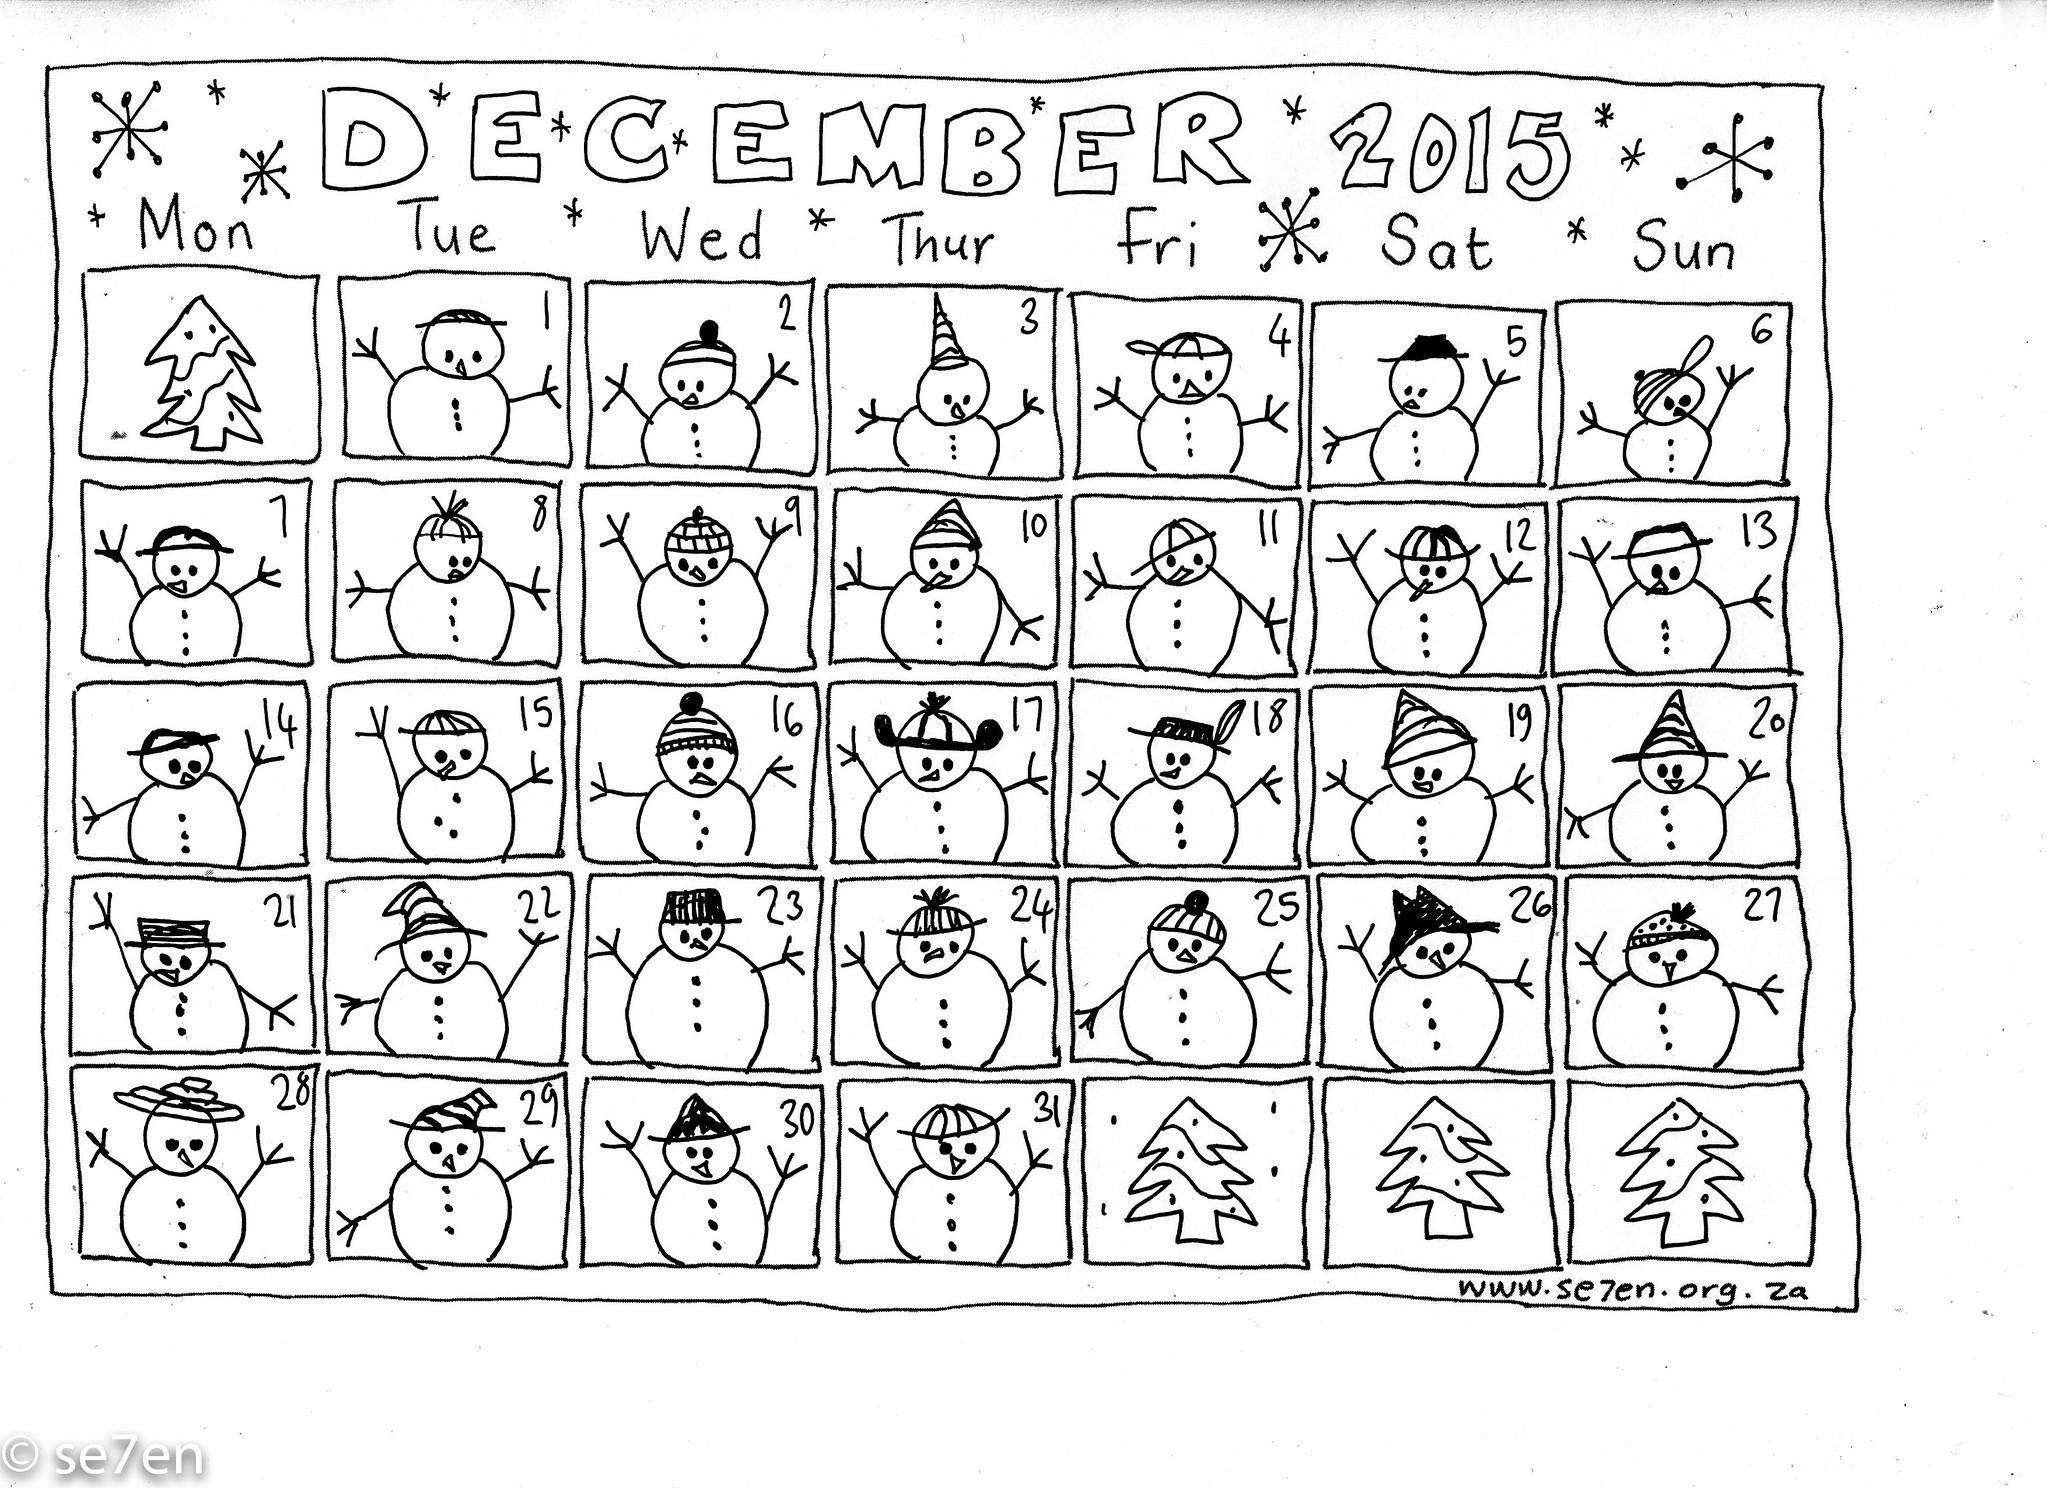 Se7en S December